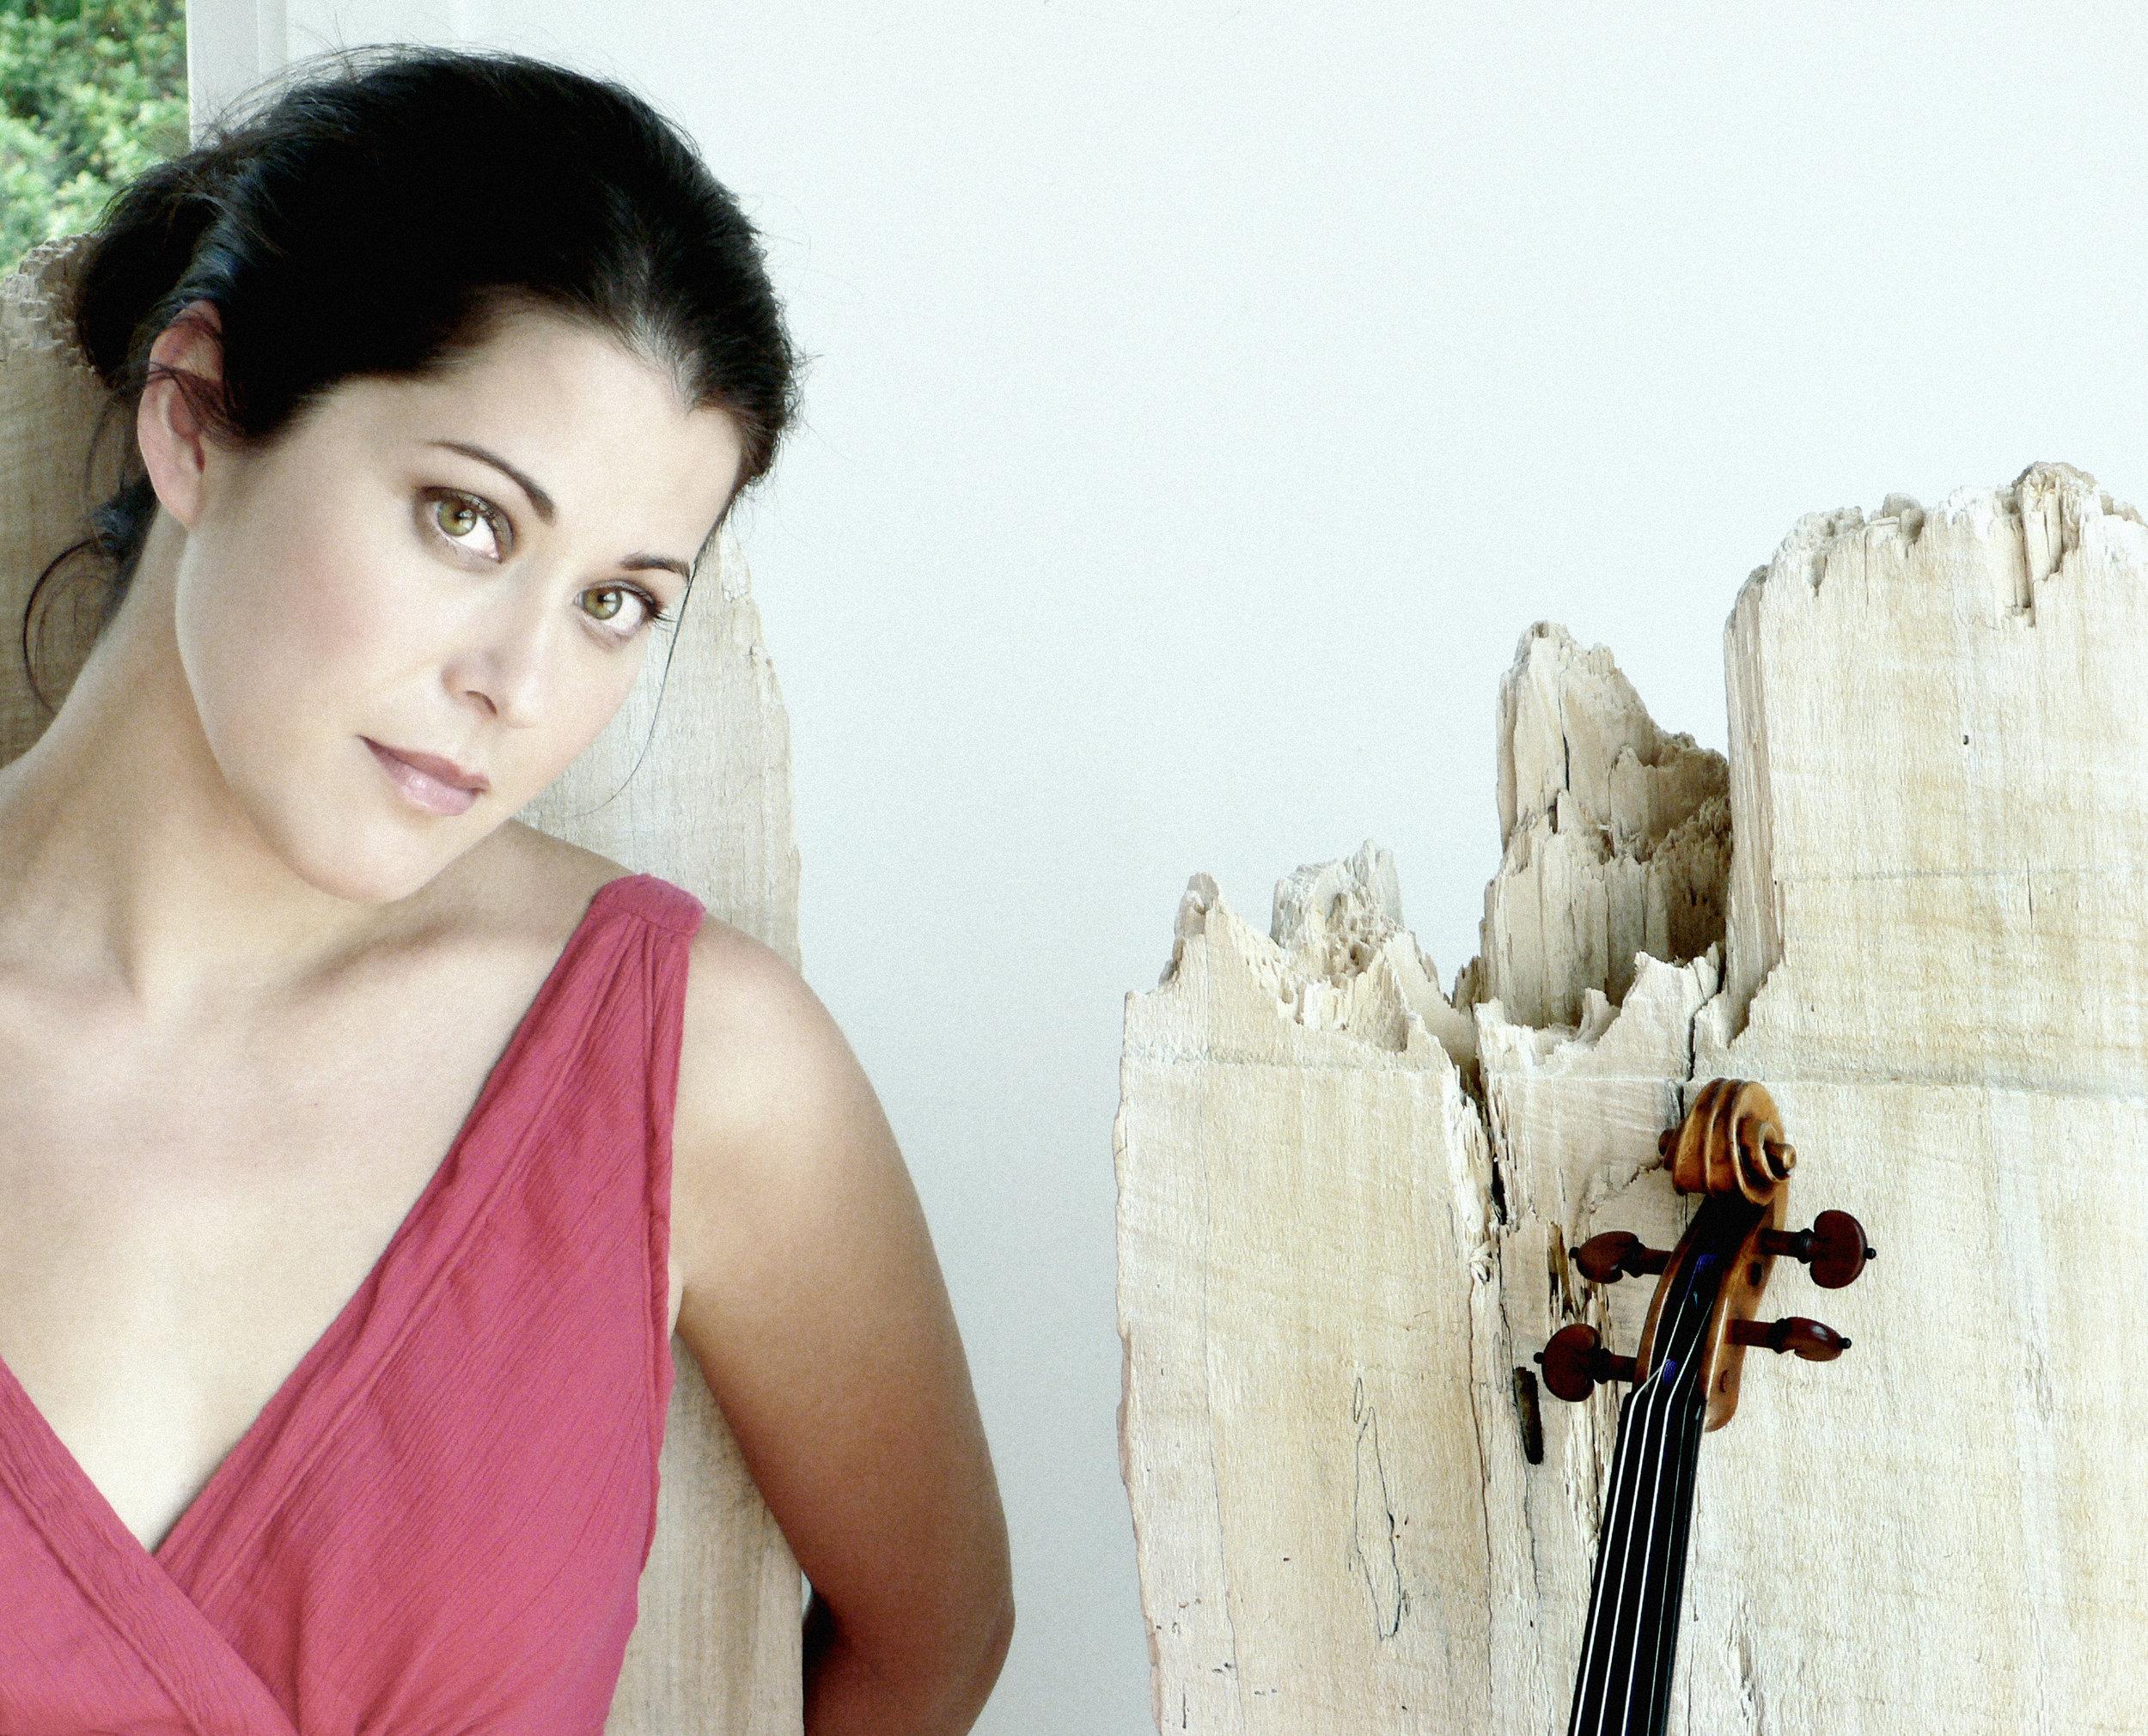 Jennifer Frautschi, photo by Lisa-Marie Mazzucco